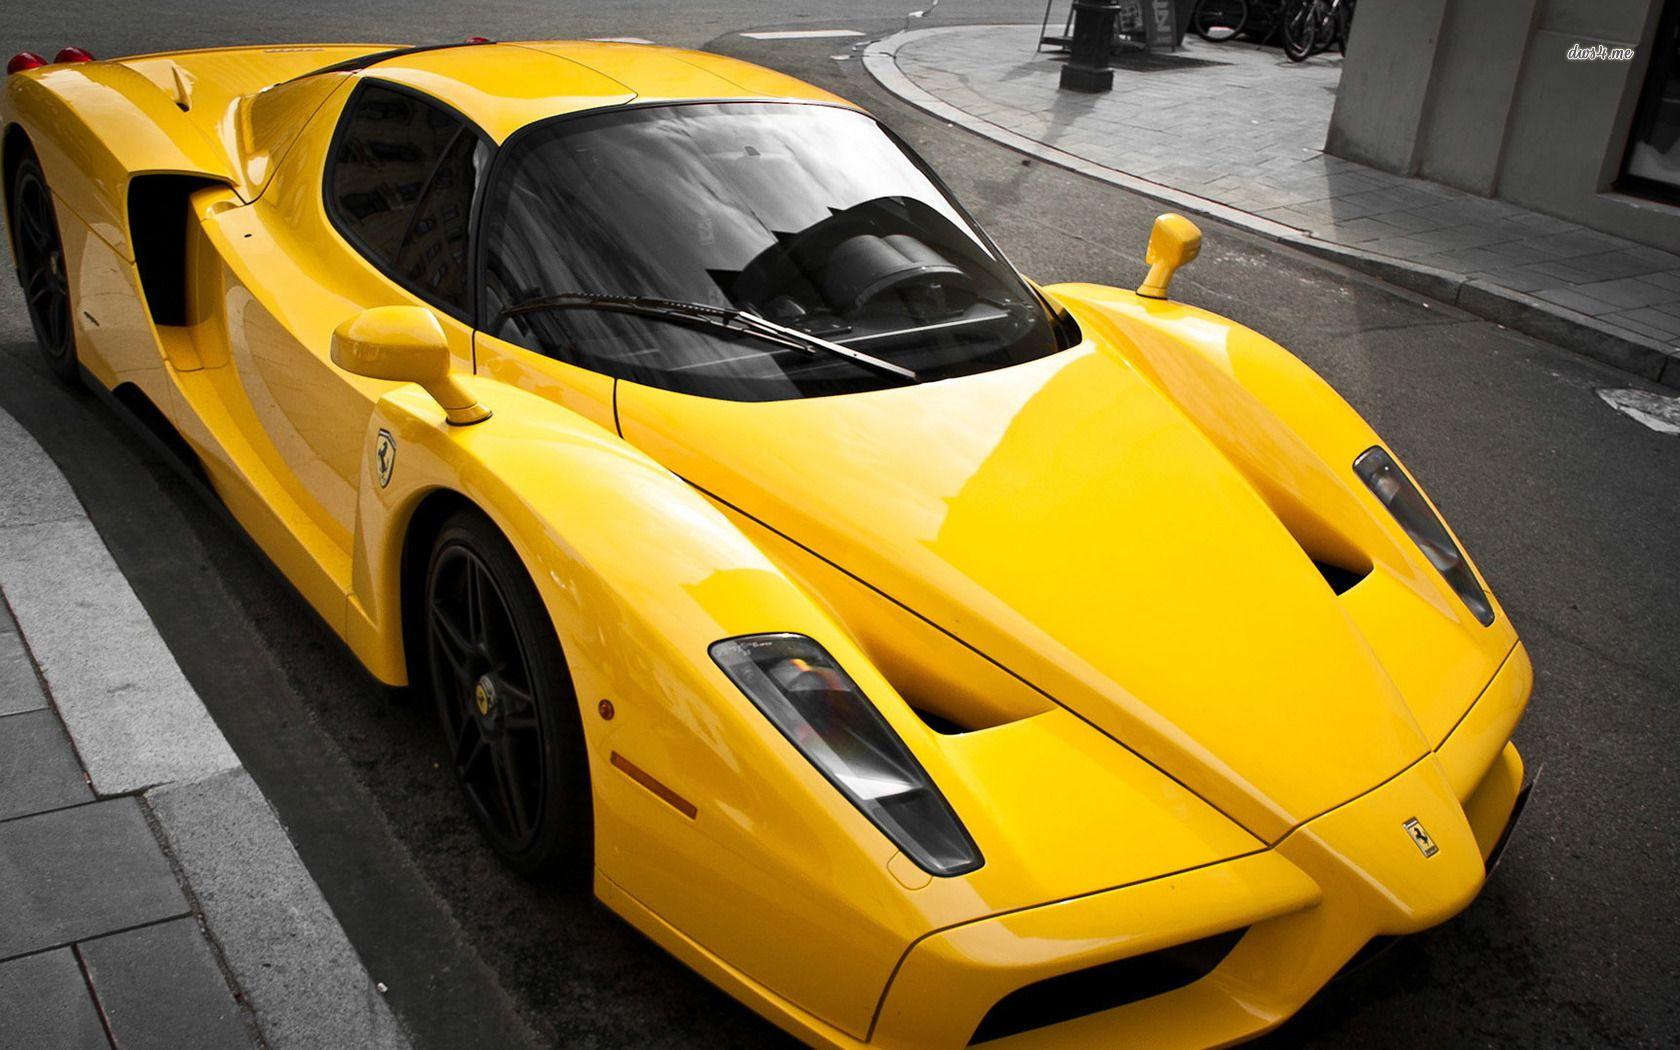 Http Cdn Desktopwallpapers4 Me Wallpapers Cars 1680x1050 5 52285 Yellow Ferrari Enzo At The Sidewalk 1680x1050 Car Wallpaper Ferrari Ferrari Enzo Ferrari Car